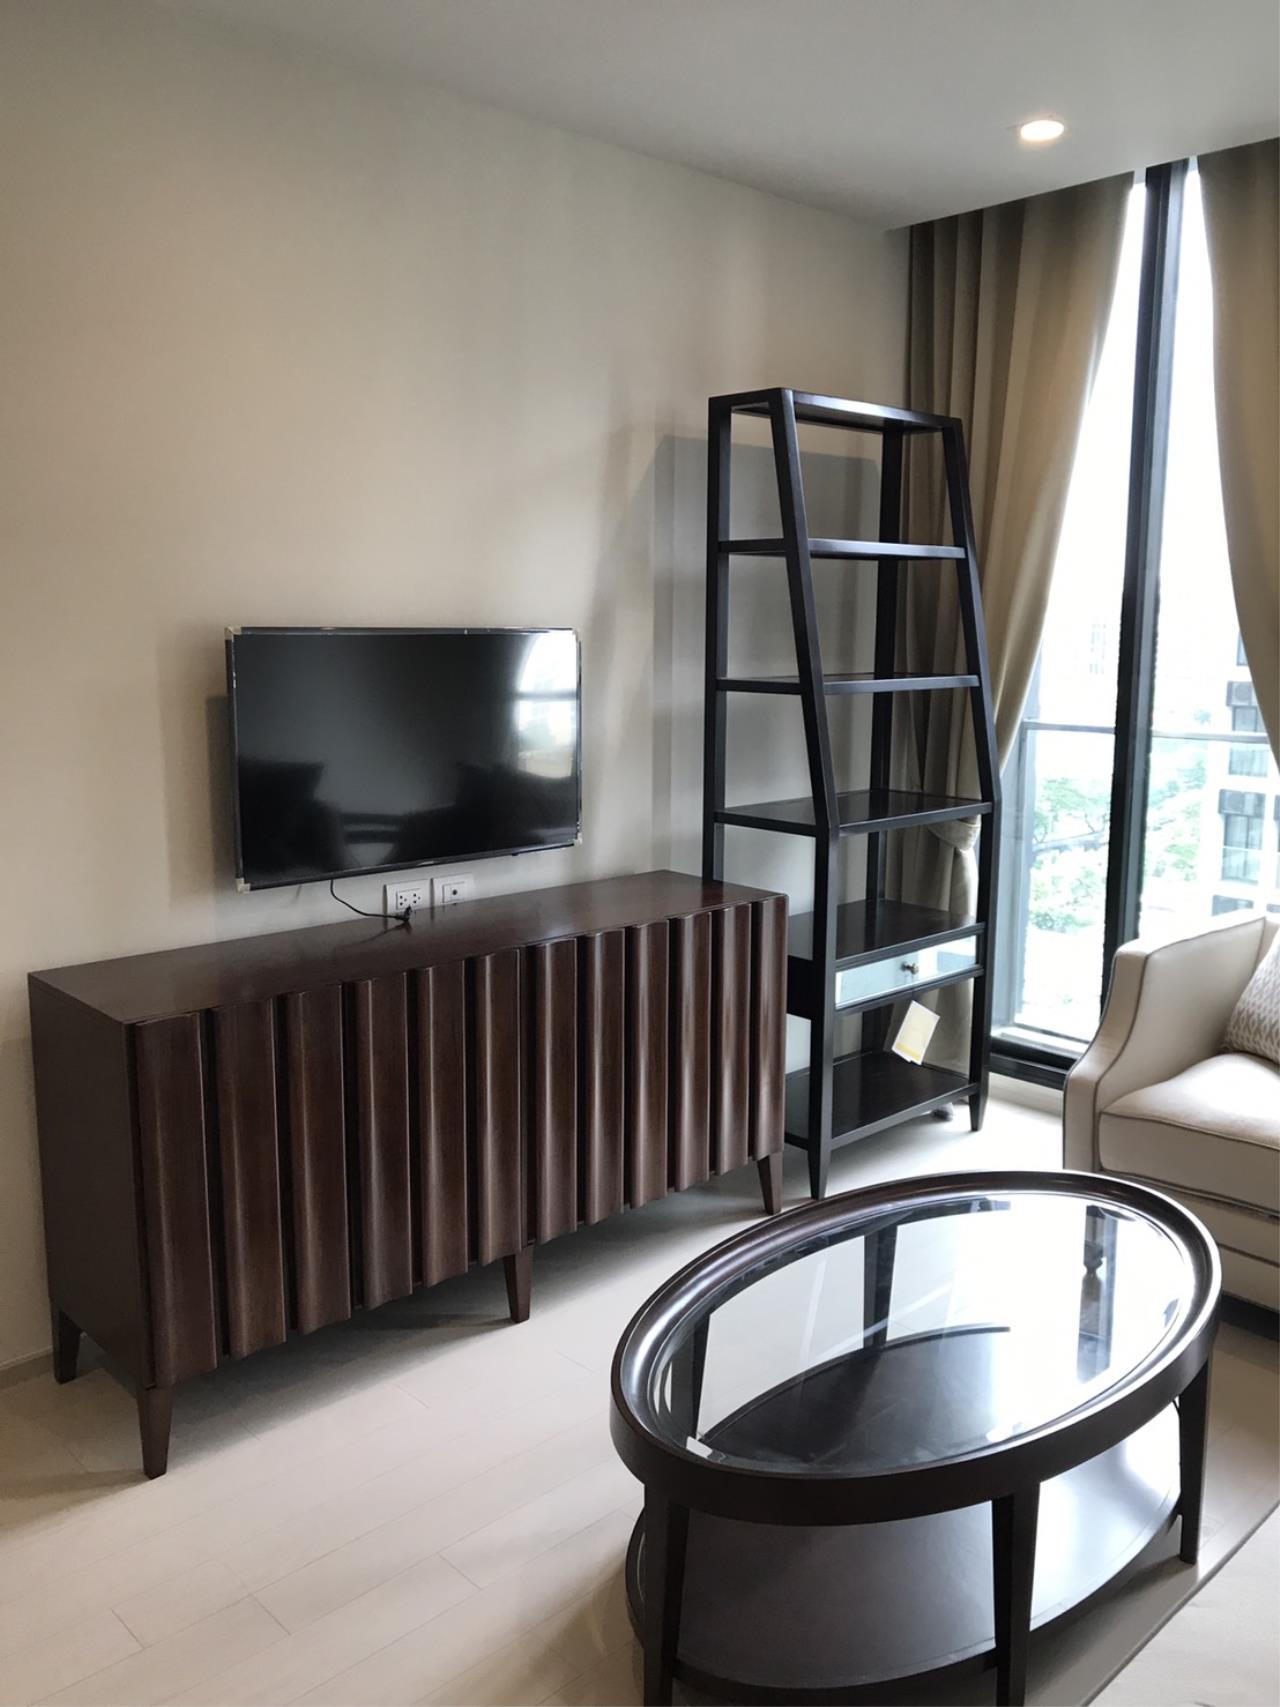 RE/MAX Properties Agency's 1 Bedroom for Rent Noble Ploenchit 4